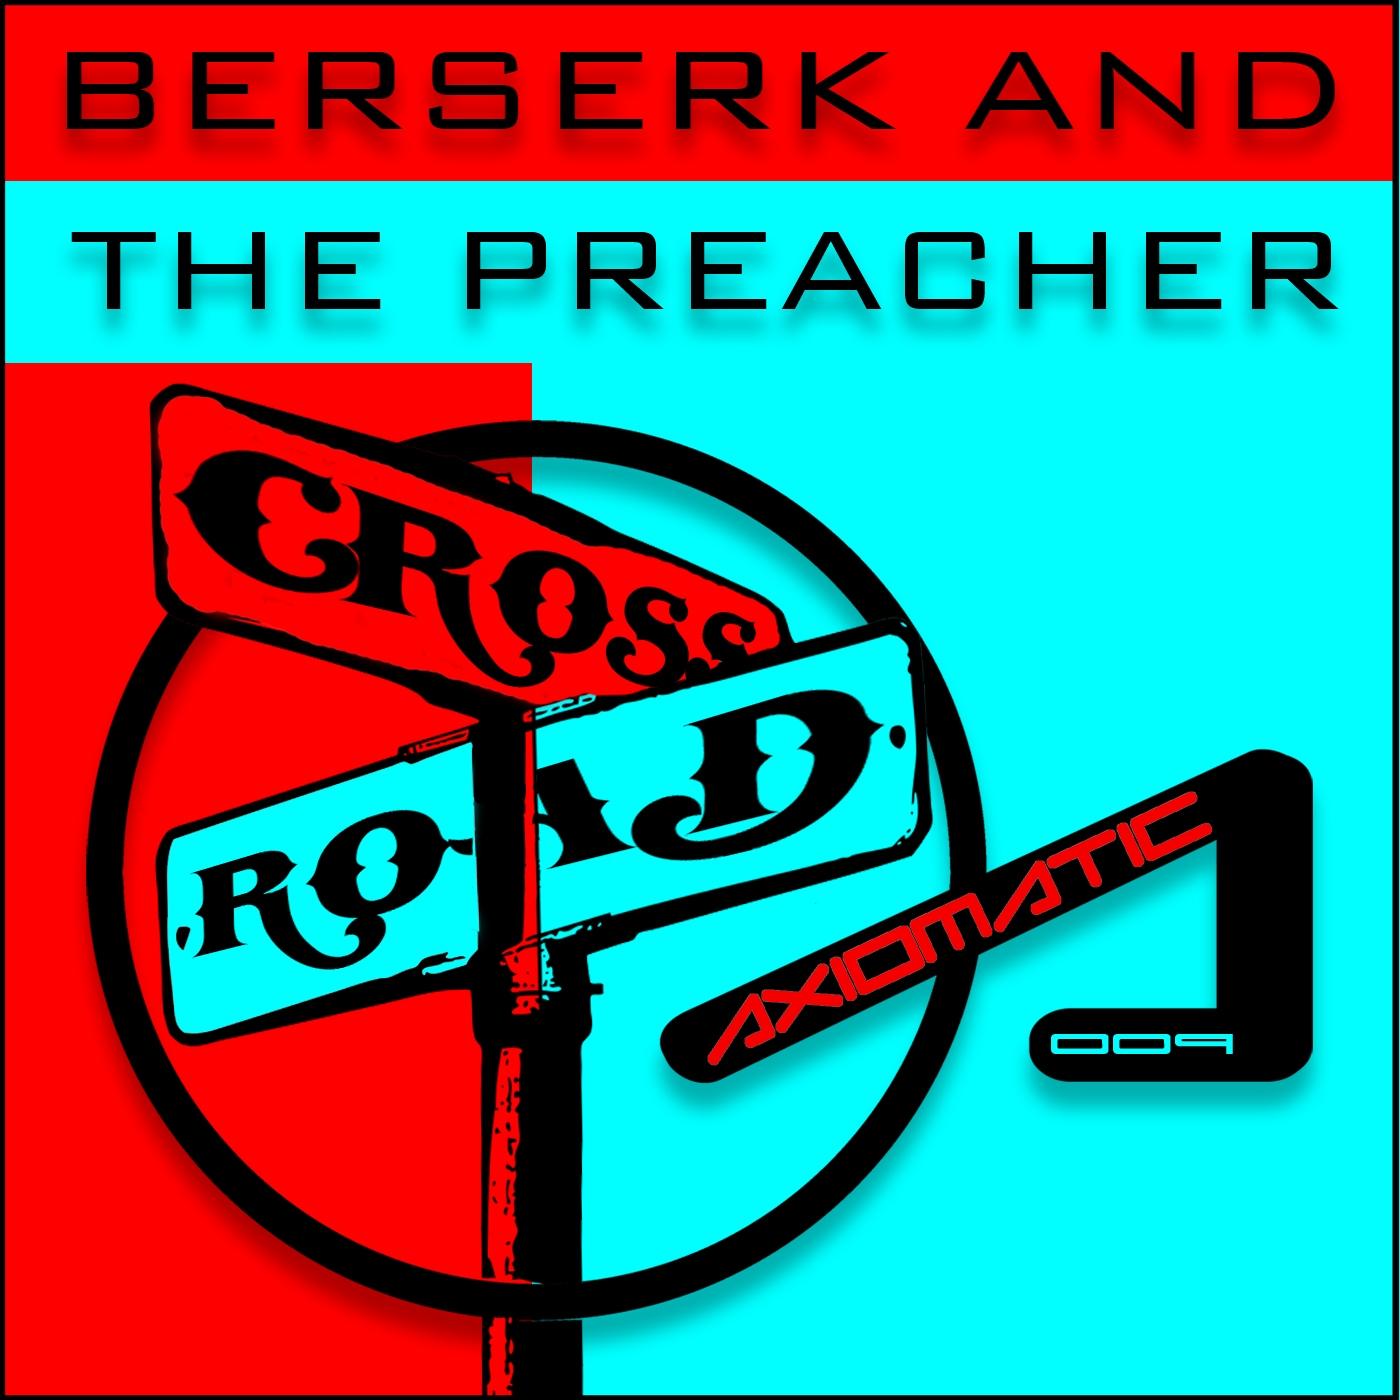 Berserk & The Preacher - Speak Hear & See No Evil (Original mix)